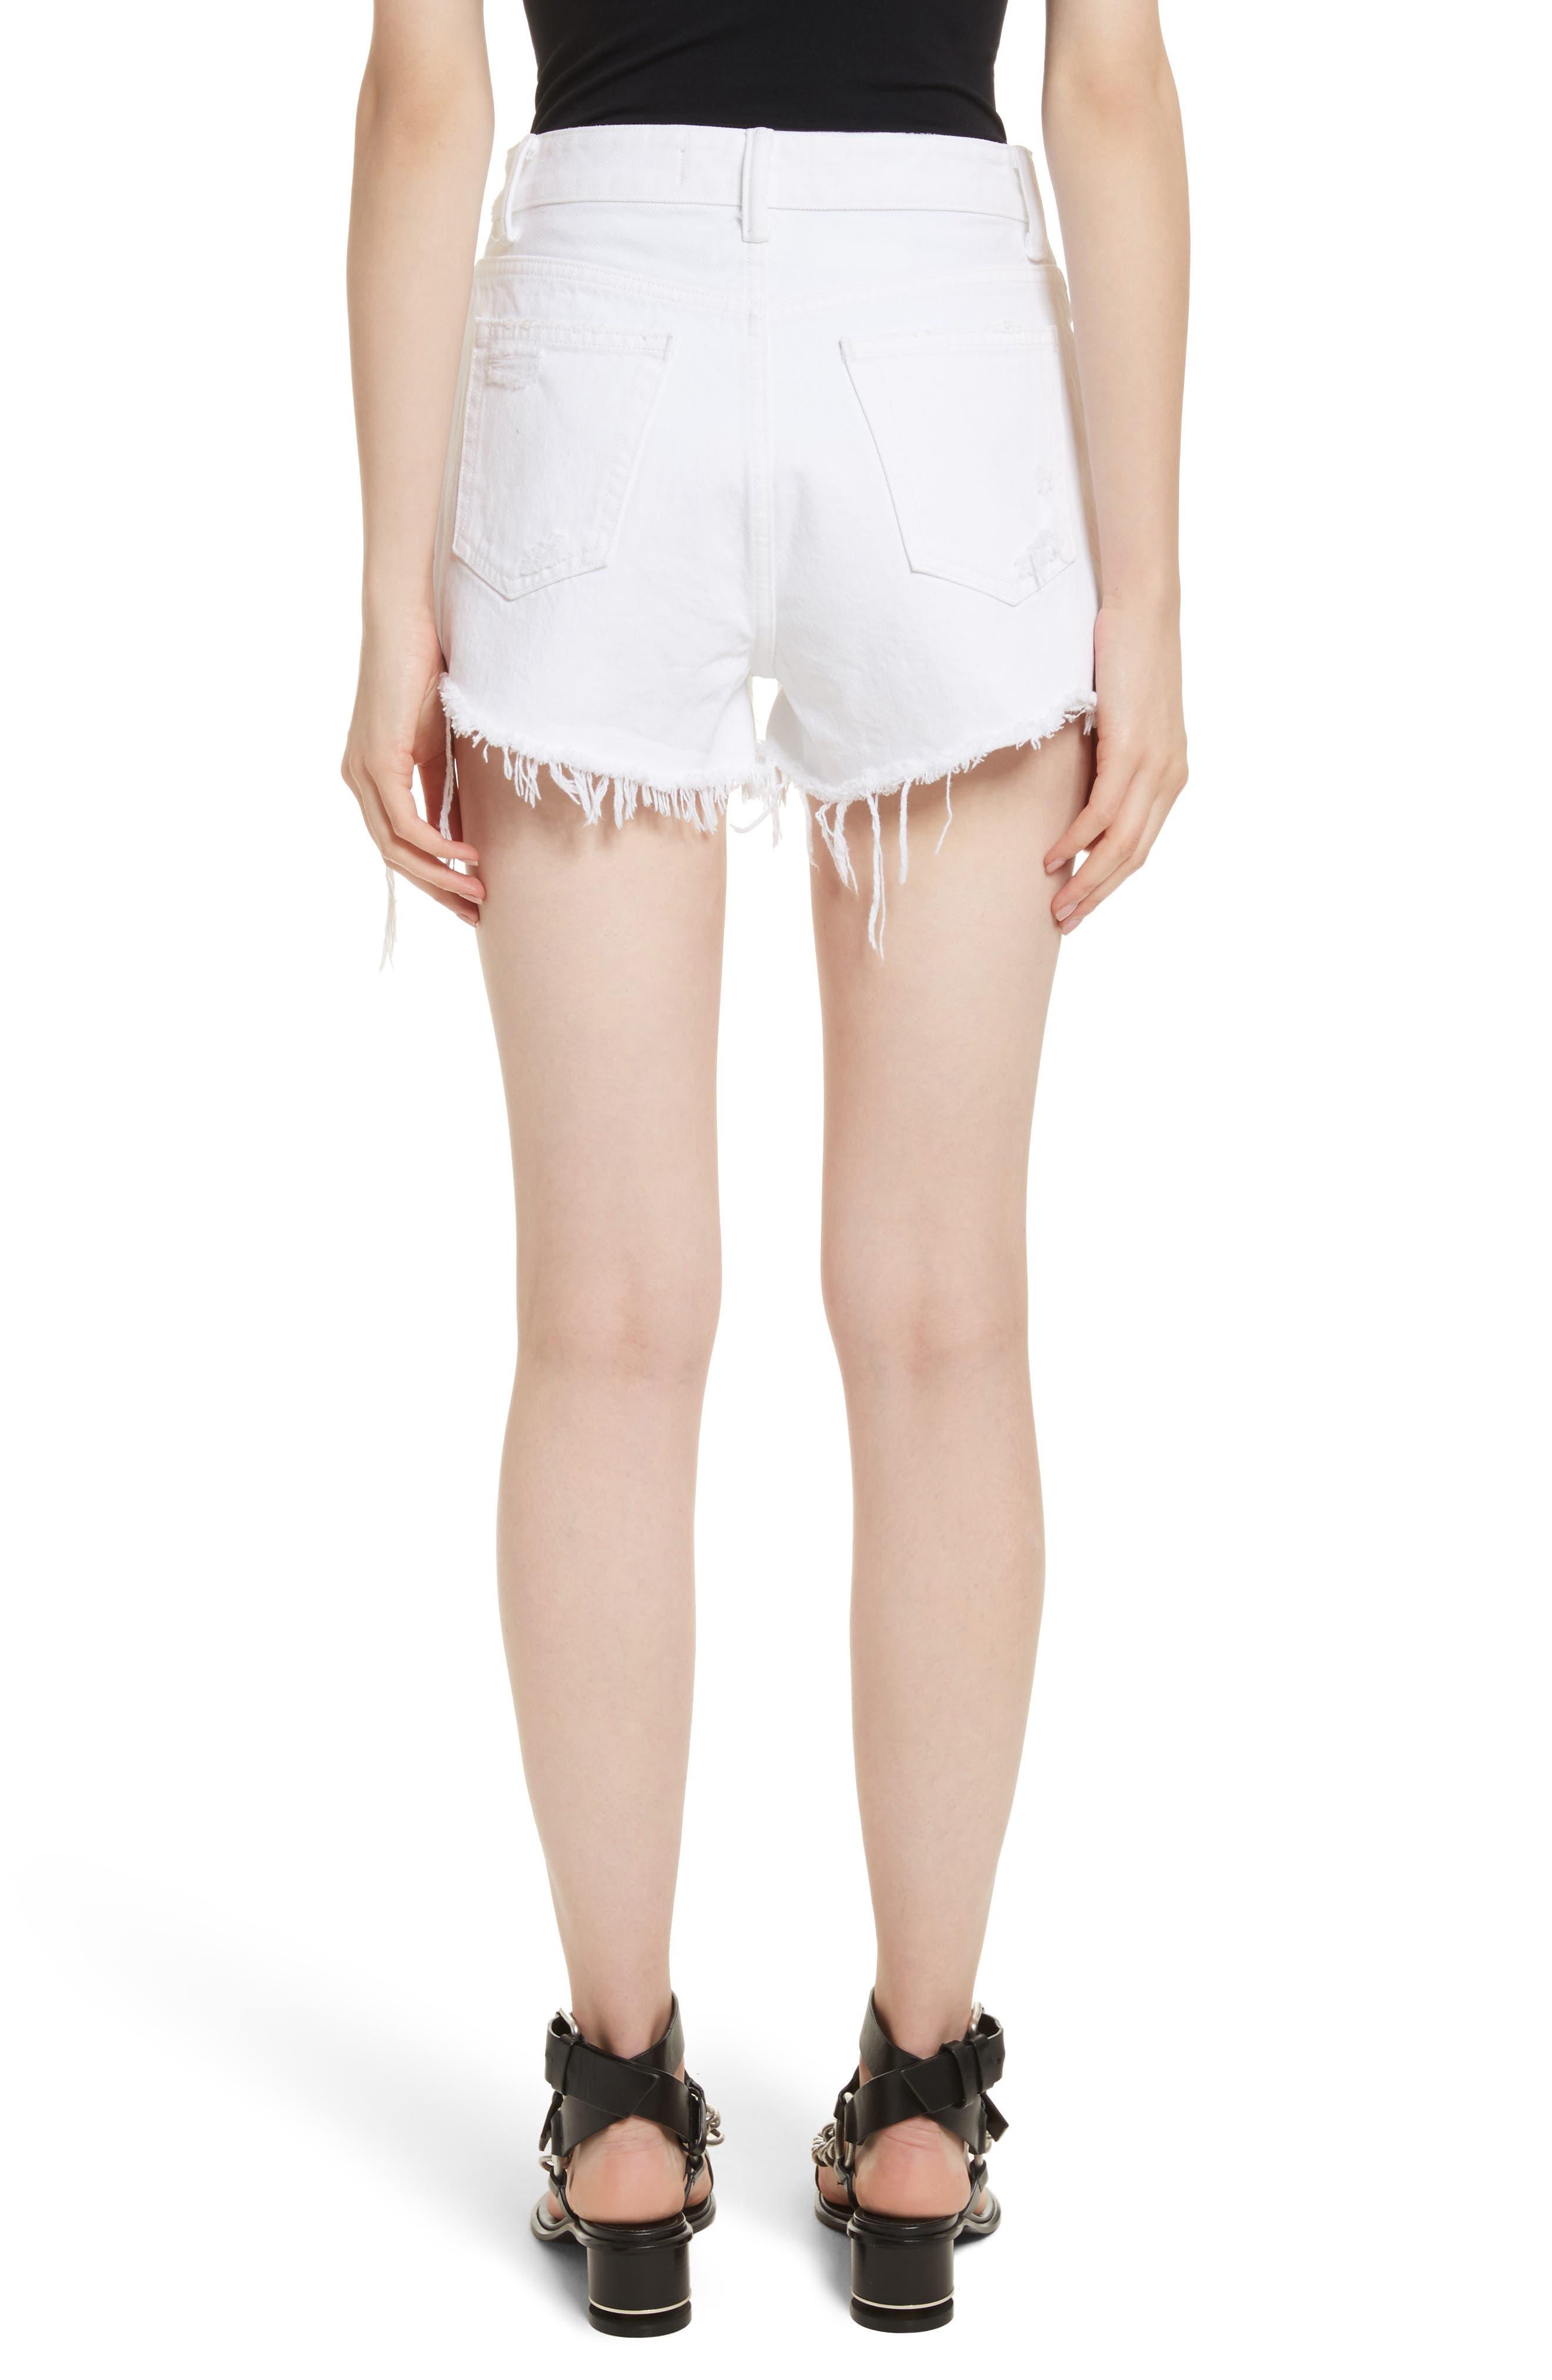 Bite White Ripped Denim Shorts,                             Alternate thumbnail 2, color,                             Bleached Destroy